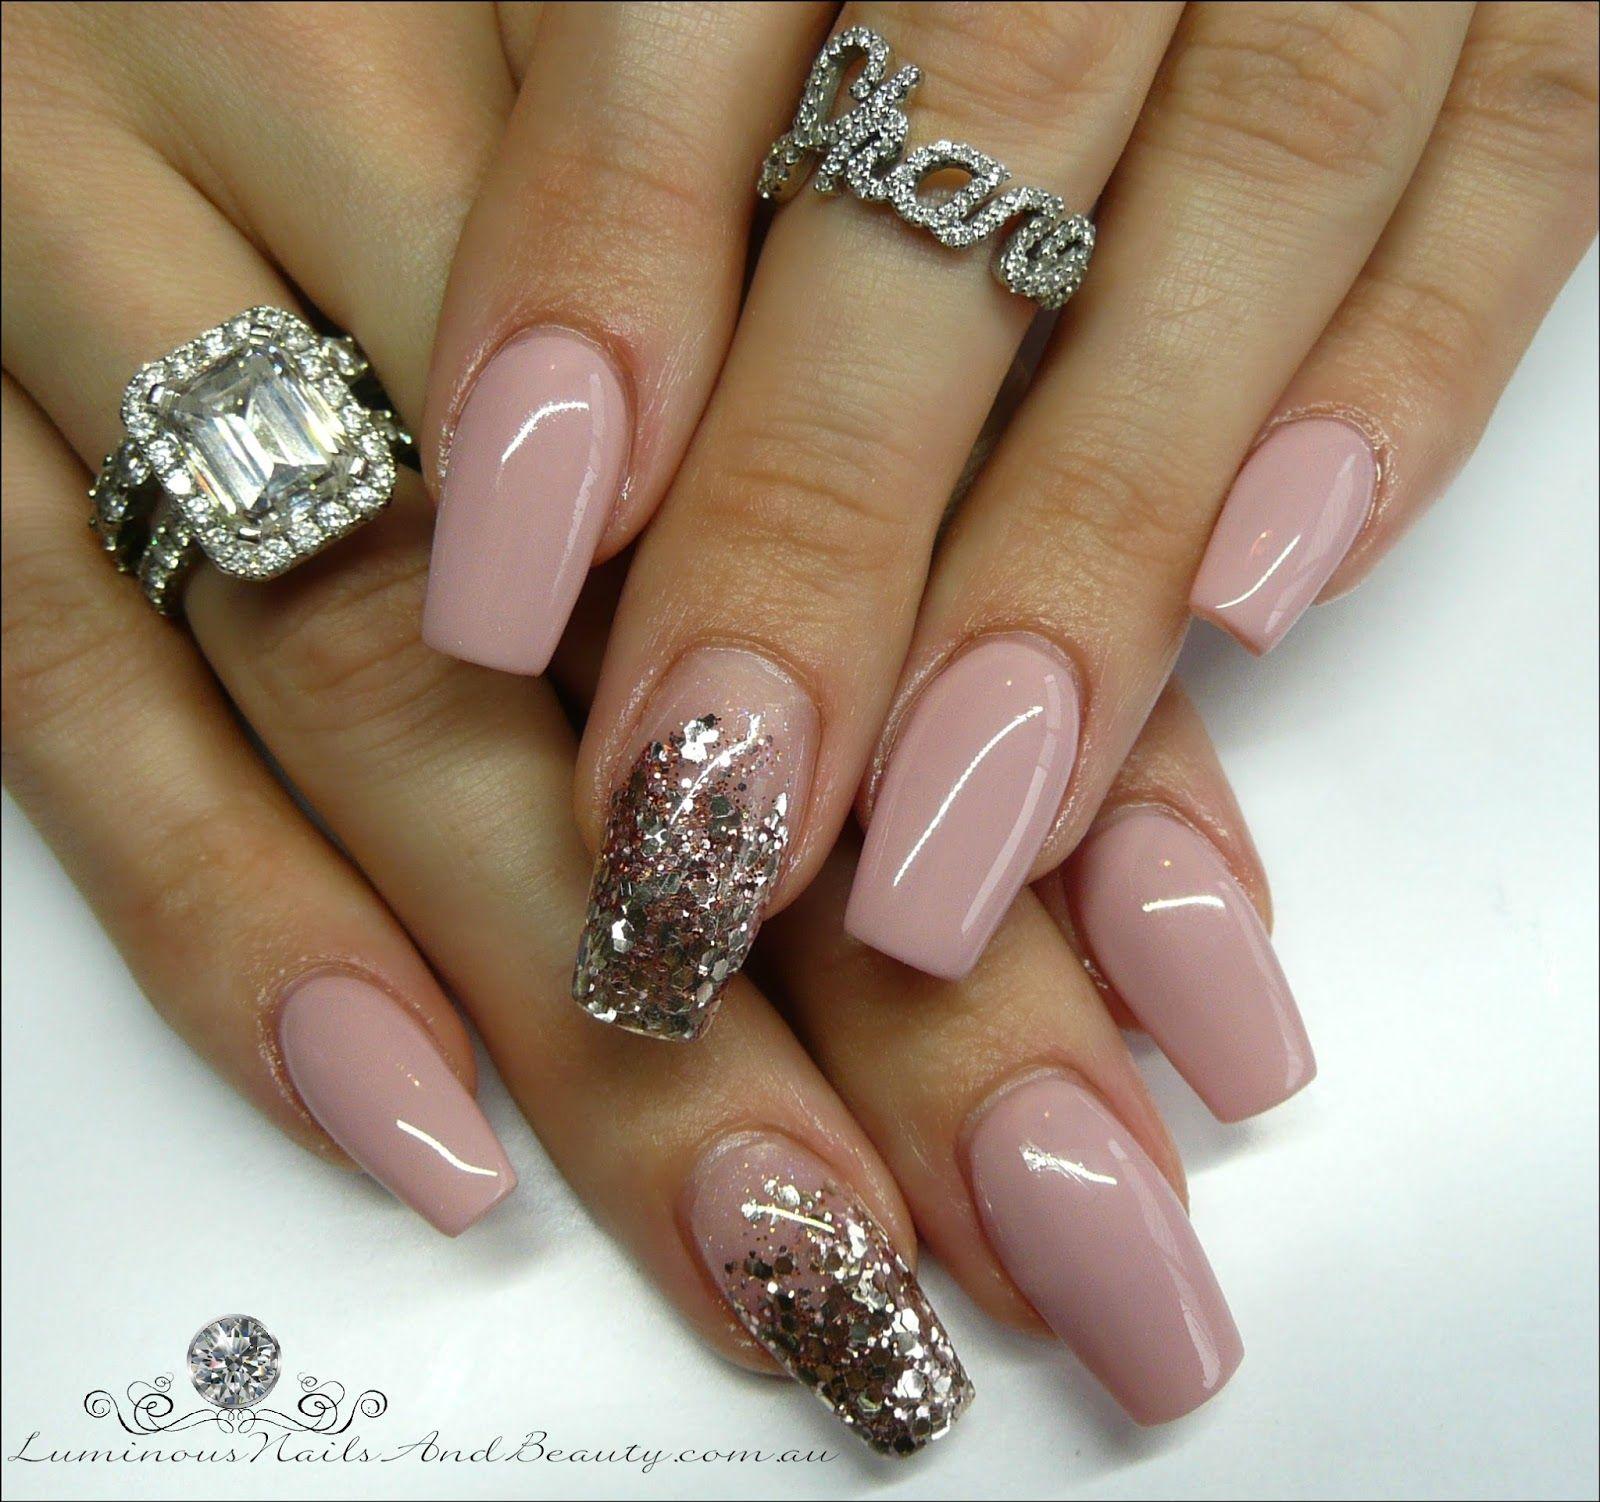 Luminous+Nails+%26+Beauty%2C+Gold+Coast+QLD.+Nude+Nails.+Rose+Gold+ ...